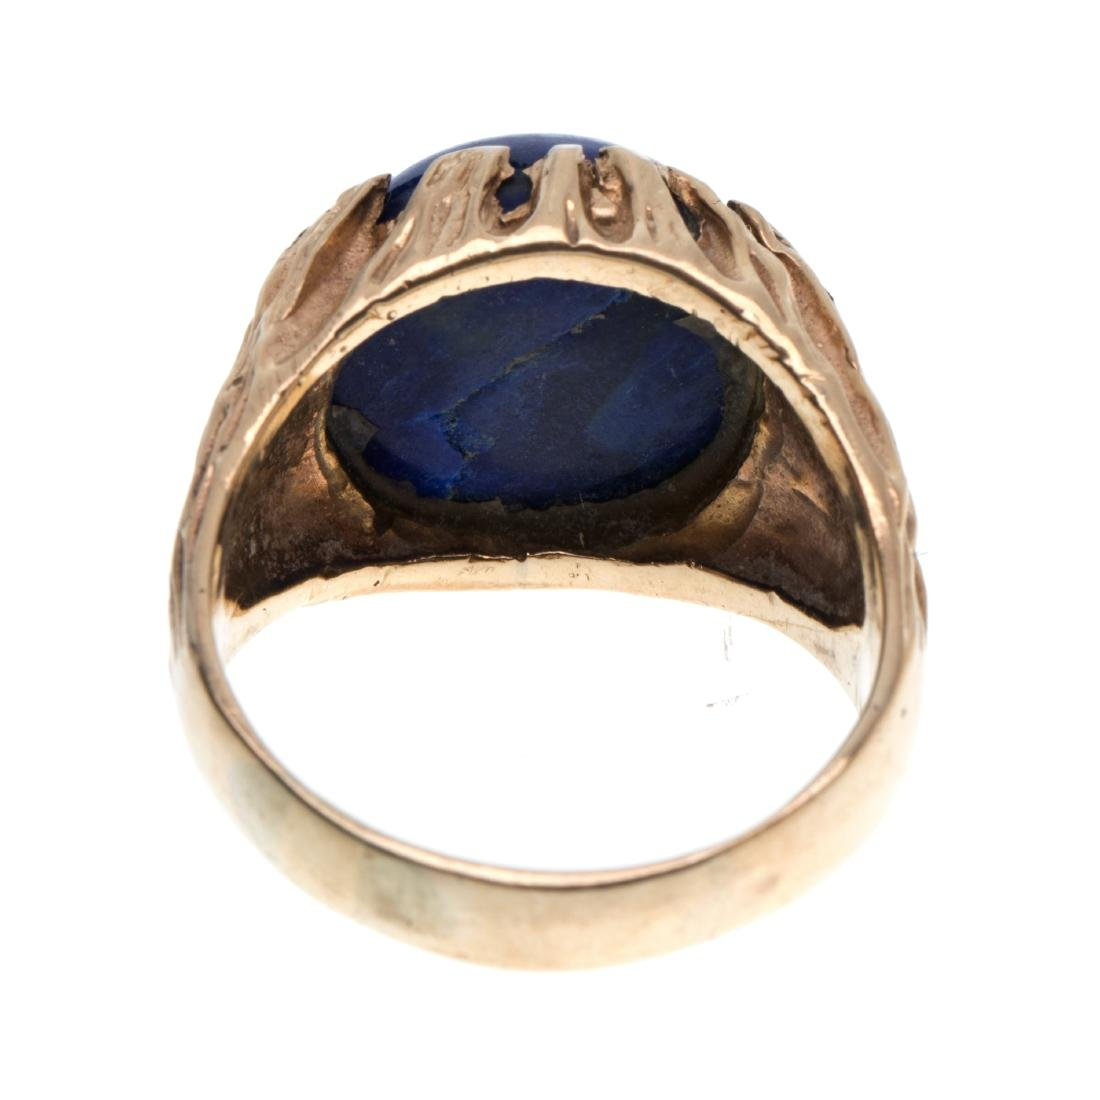 A gent's lapis lazuli, 14k ring - 3